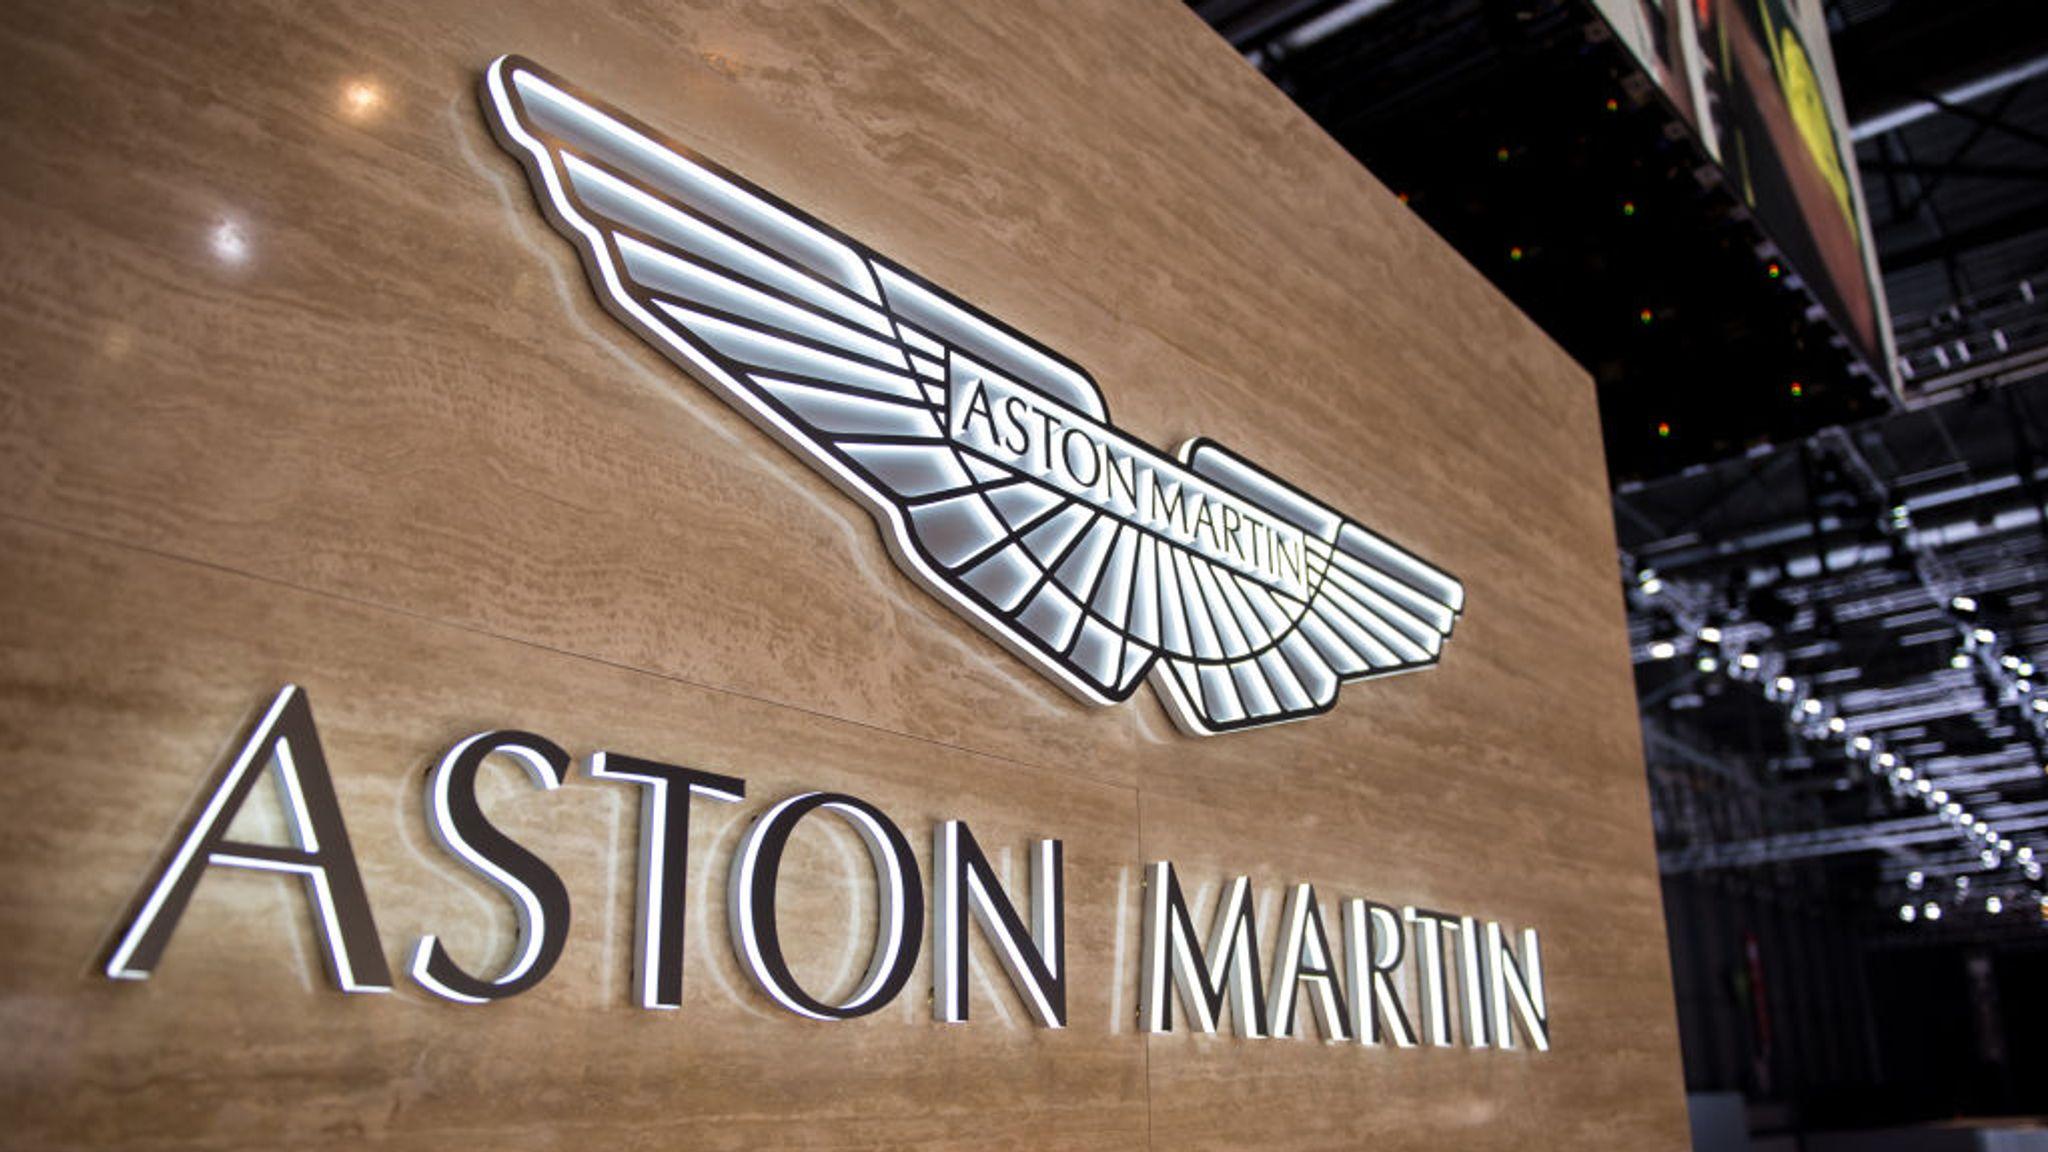 Coronanvirus Aston Martin Plans To Cut 500 Jobs Under Turnaround Plan Business News Sky News